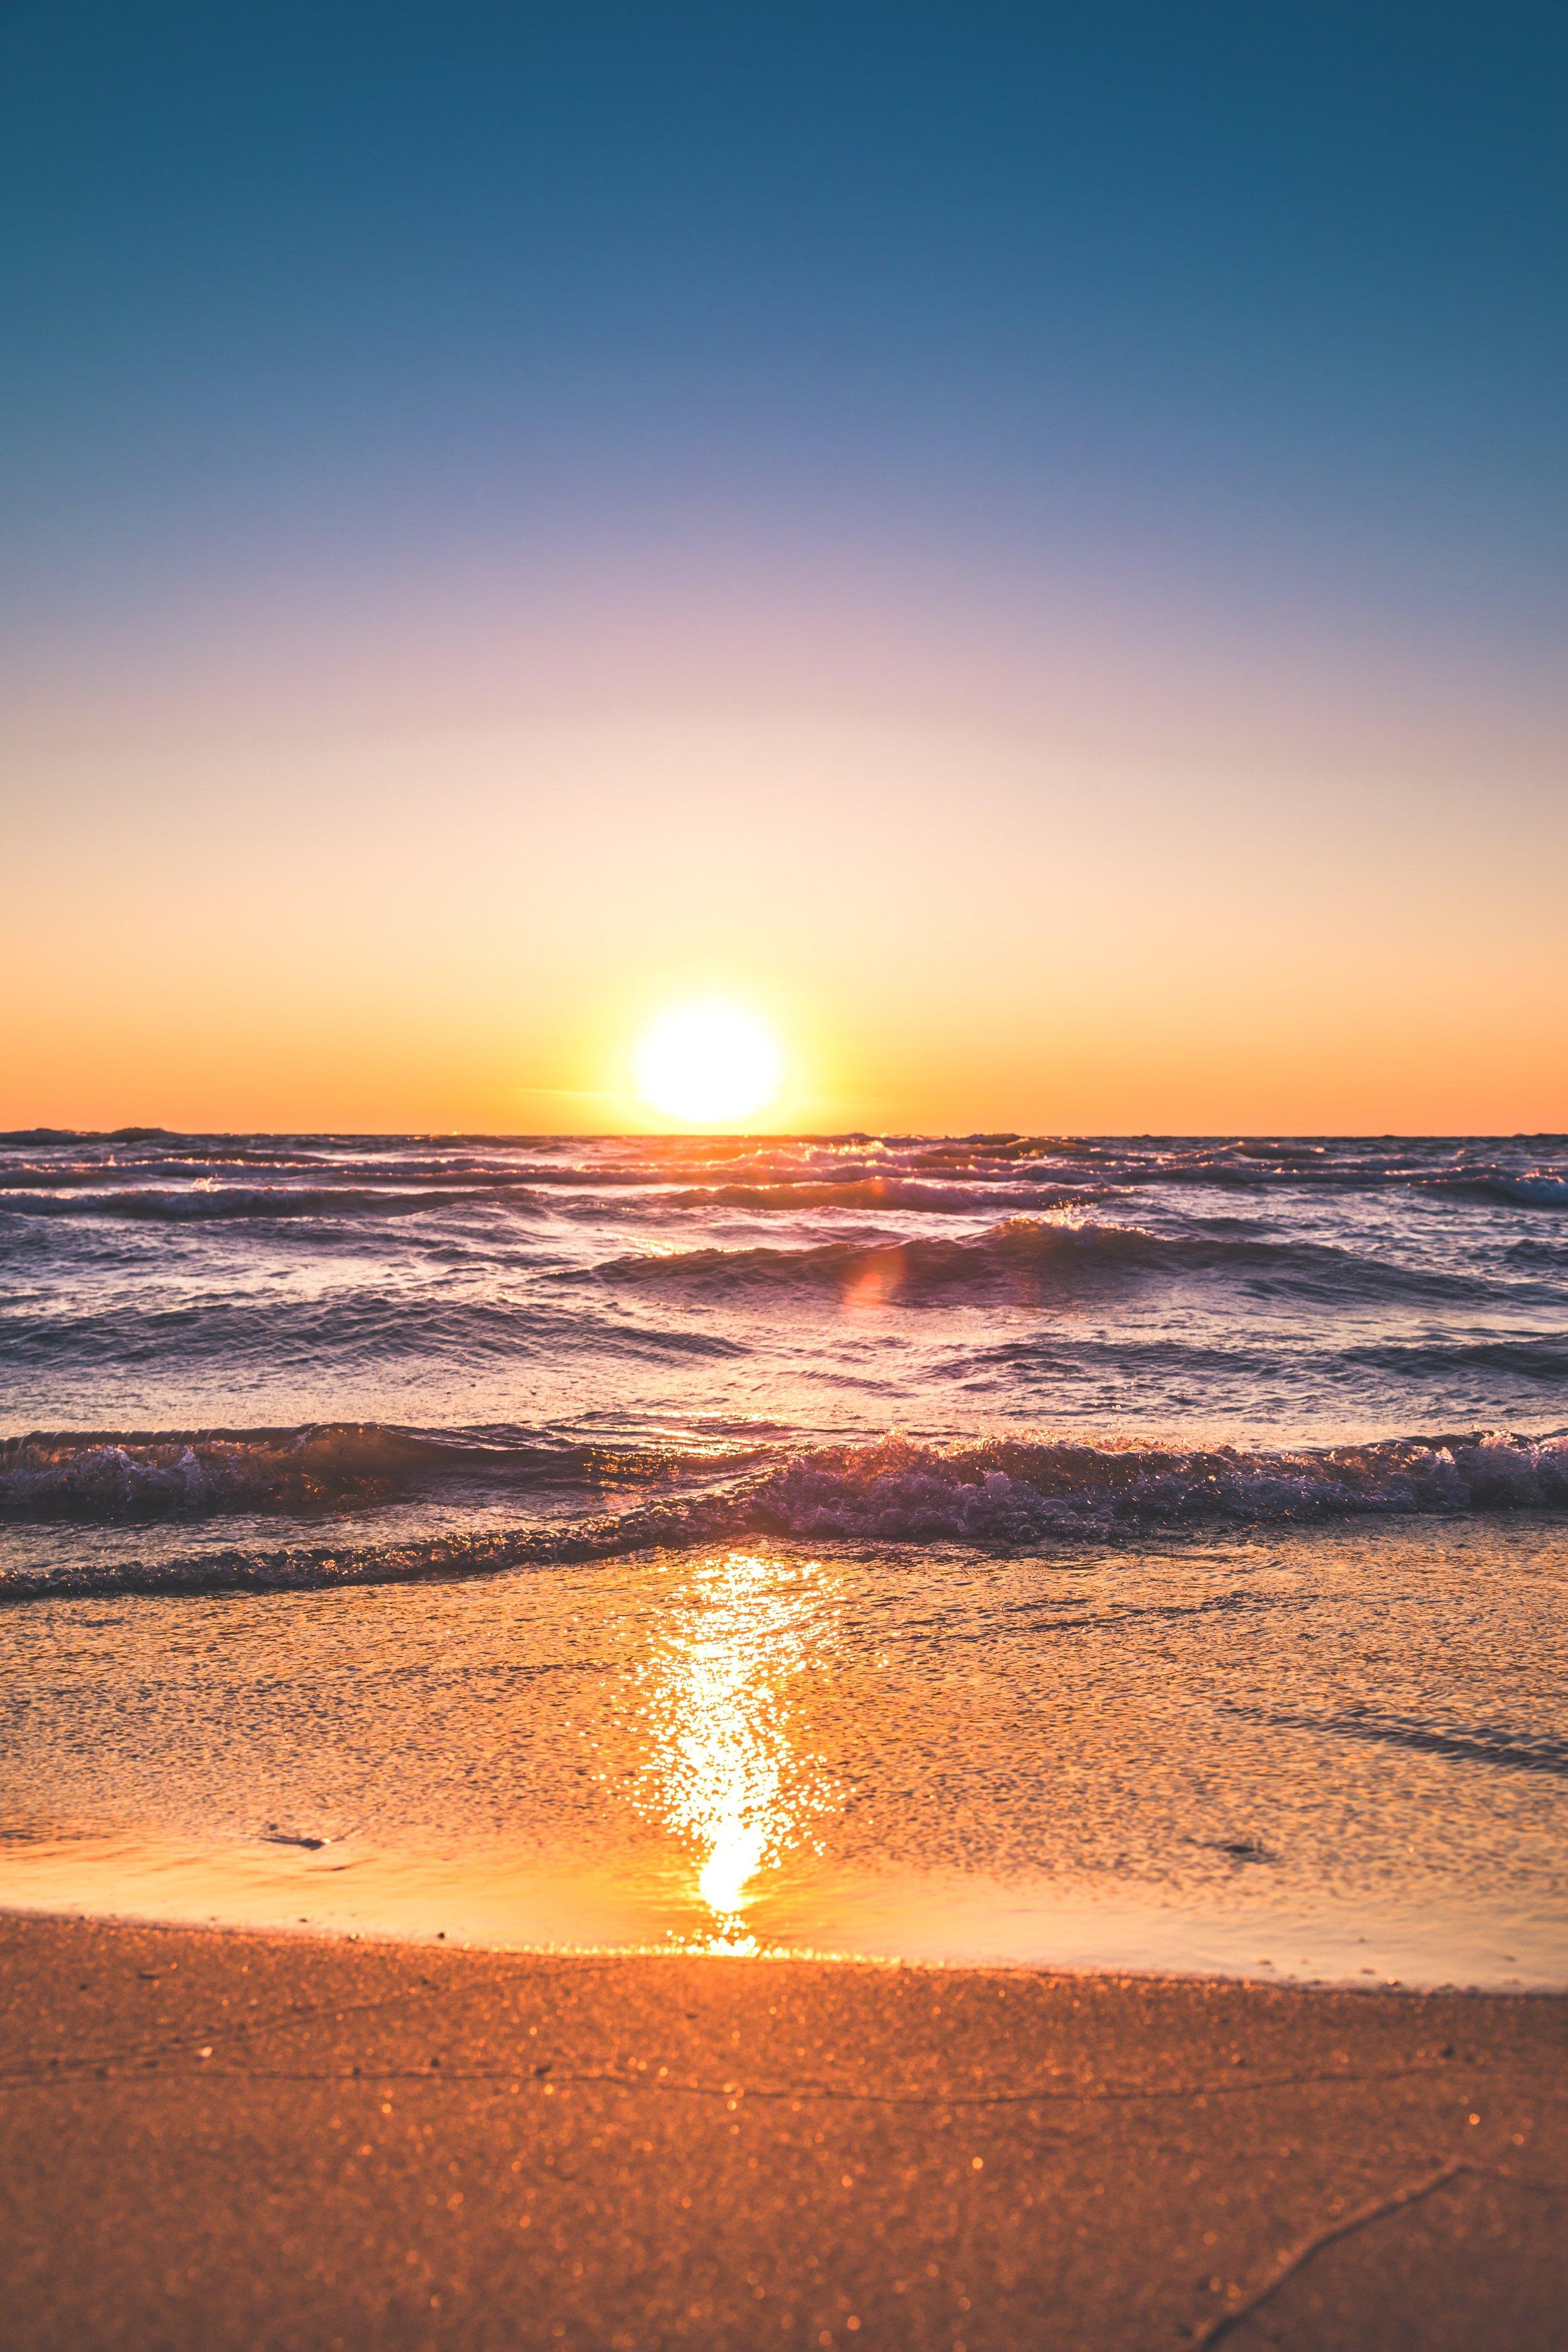 Sunset_Cayman Islands